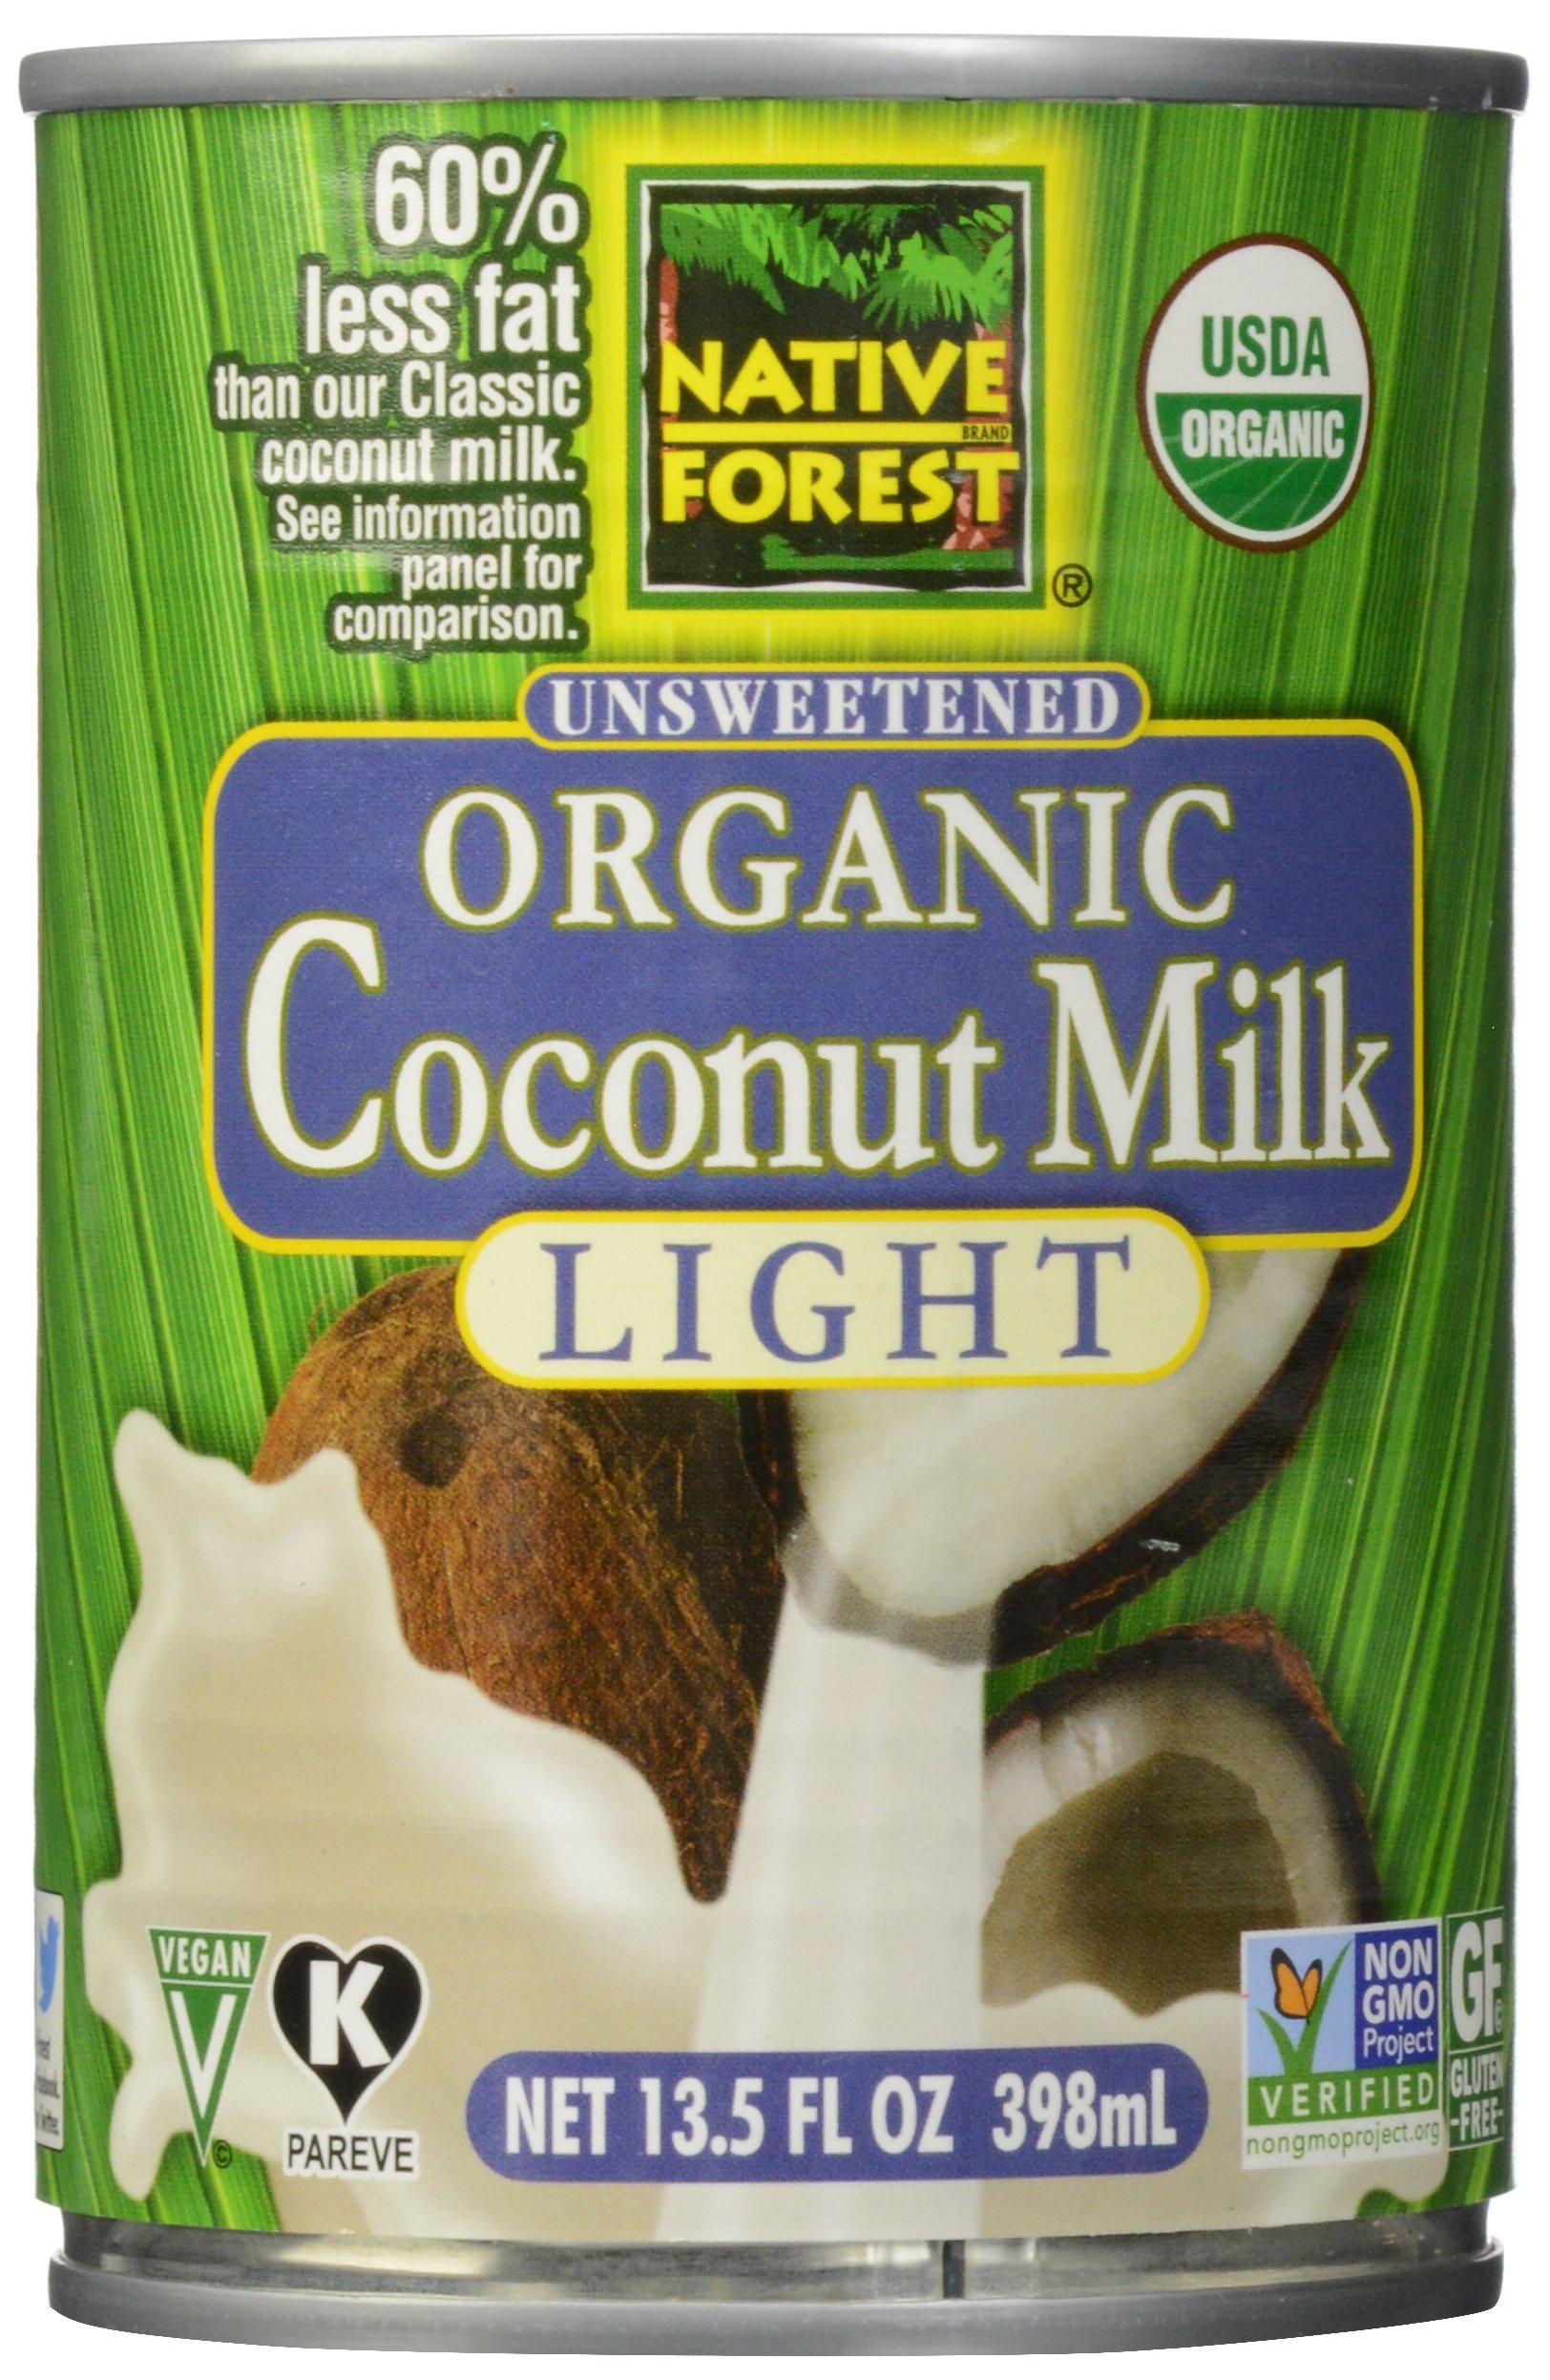 Native Forest, Organic Coconut Milk, Light, 13.5 oz